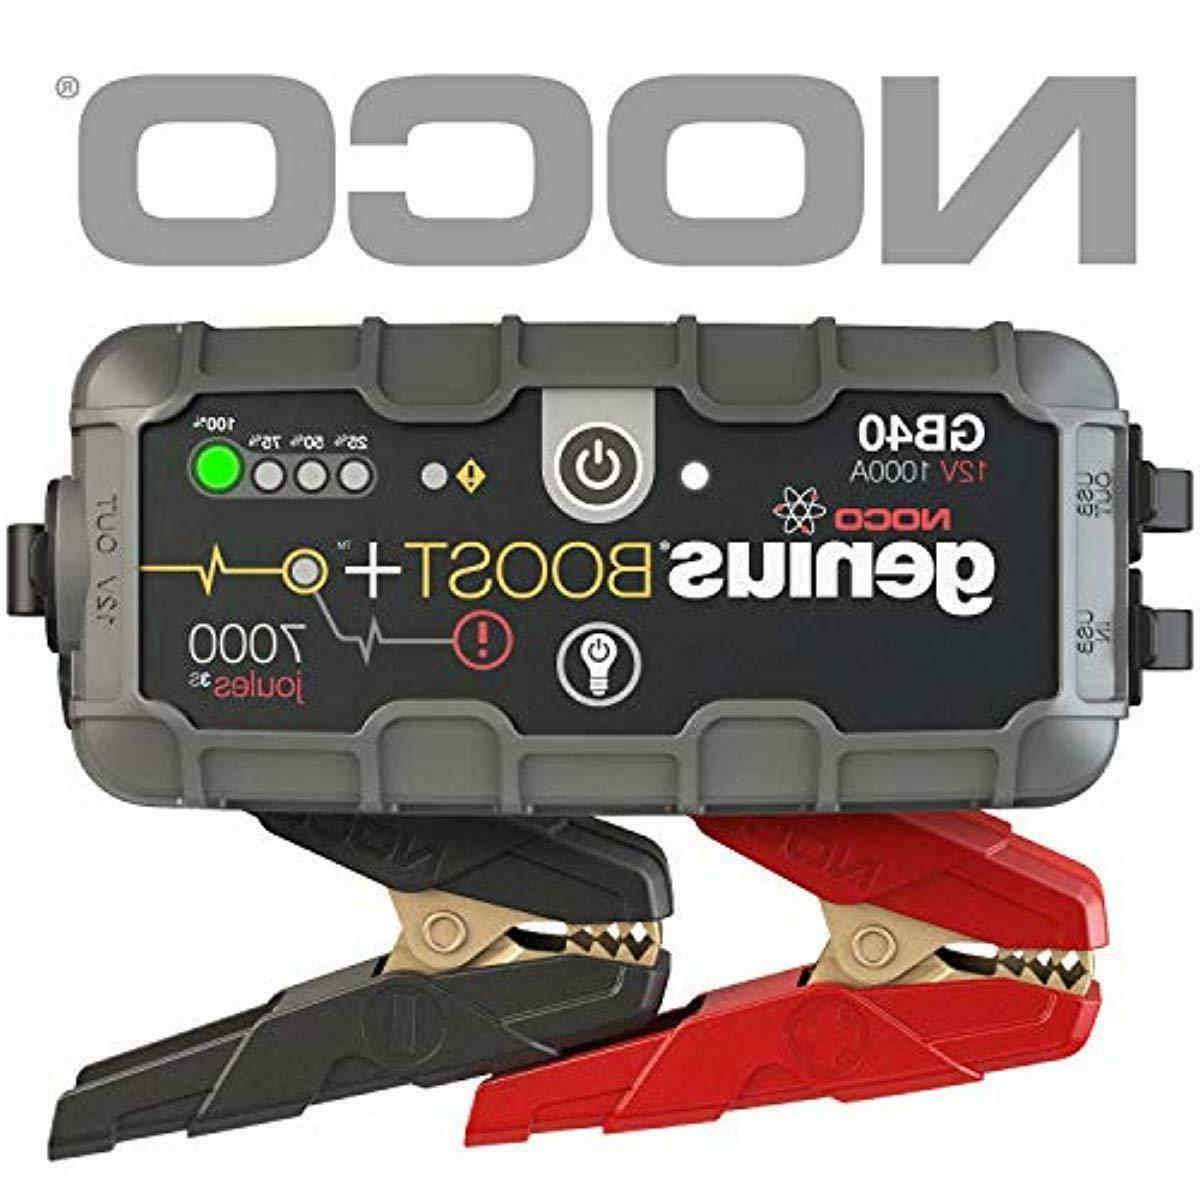 boost plus gb40 1000 amp 12v ultrasafe